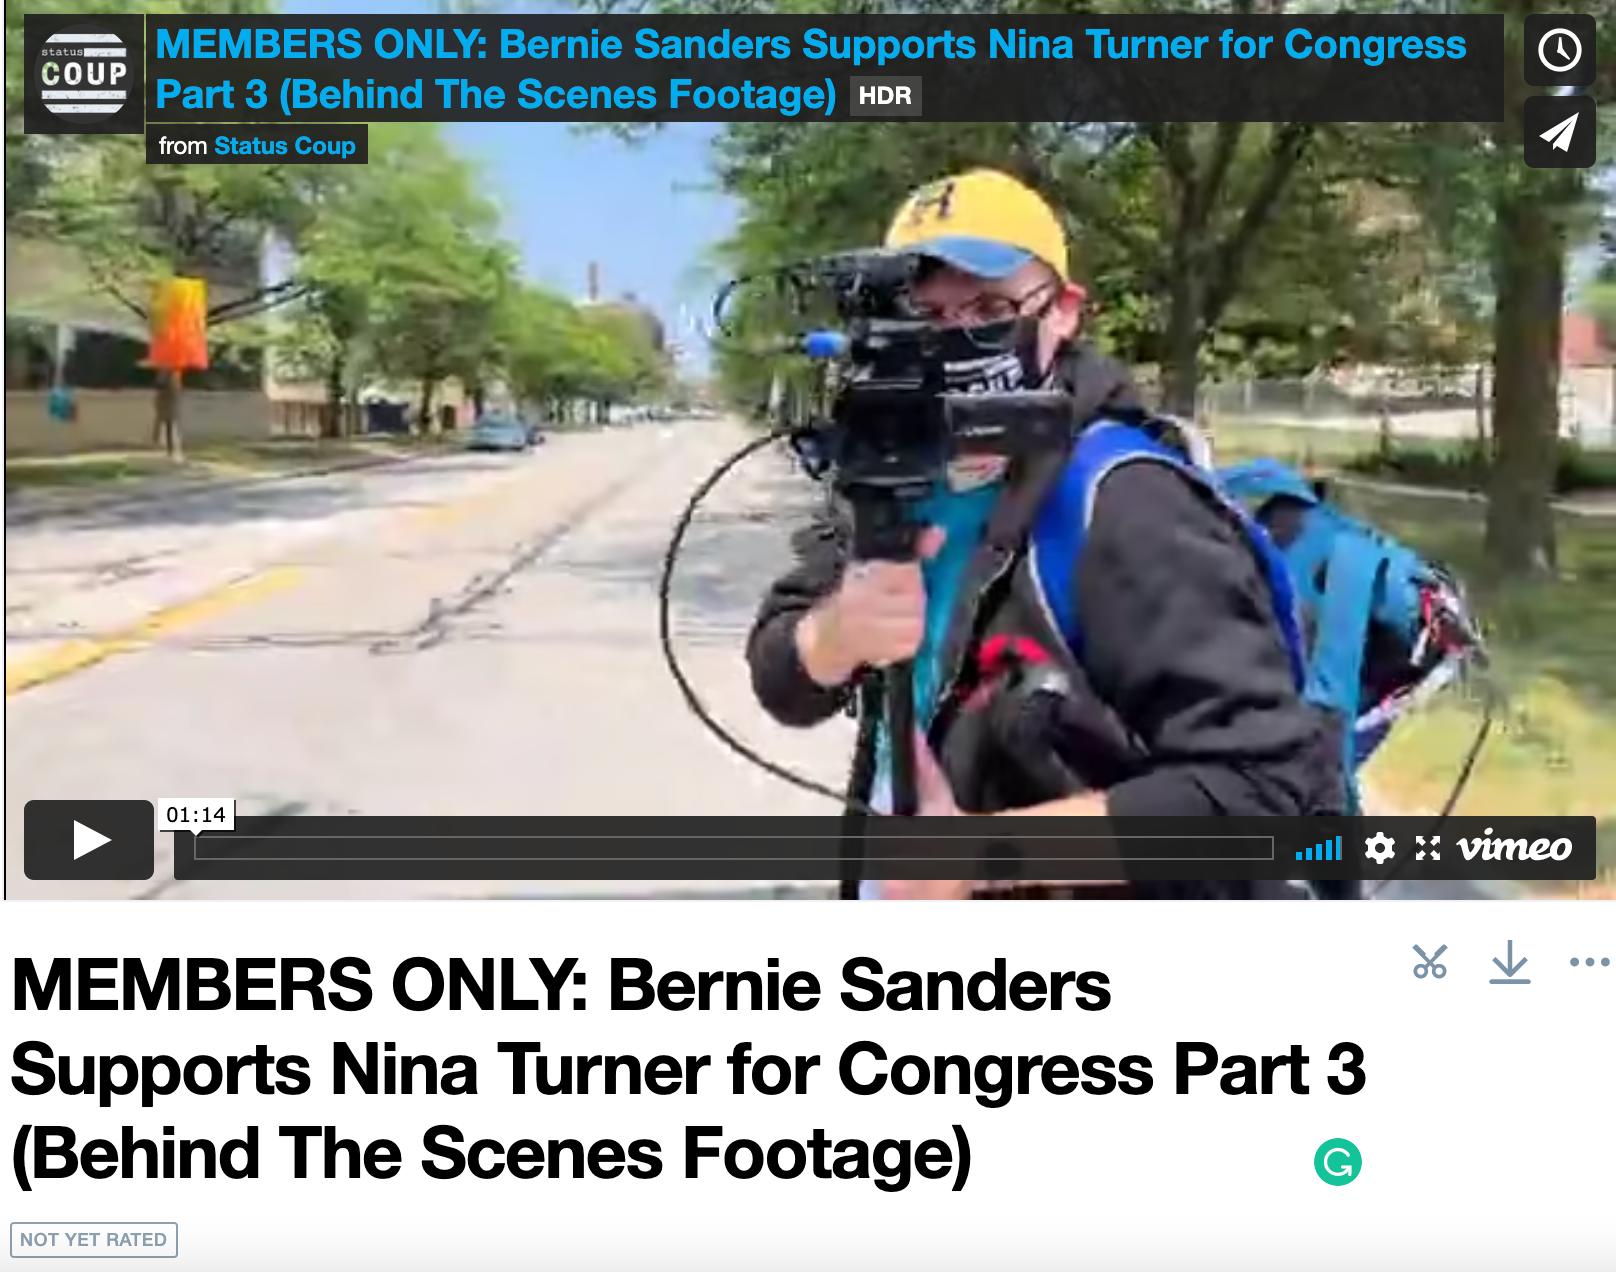 Bernie and Nina Turner Behind the Scenes Video